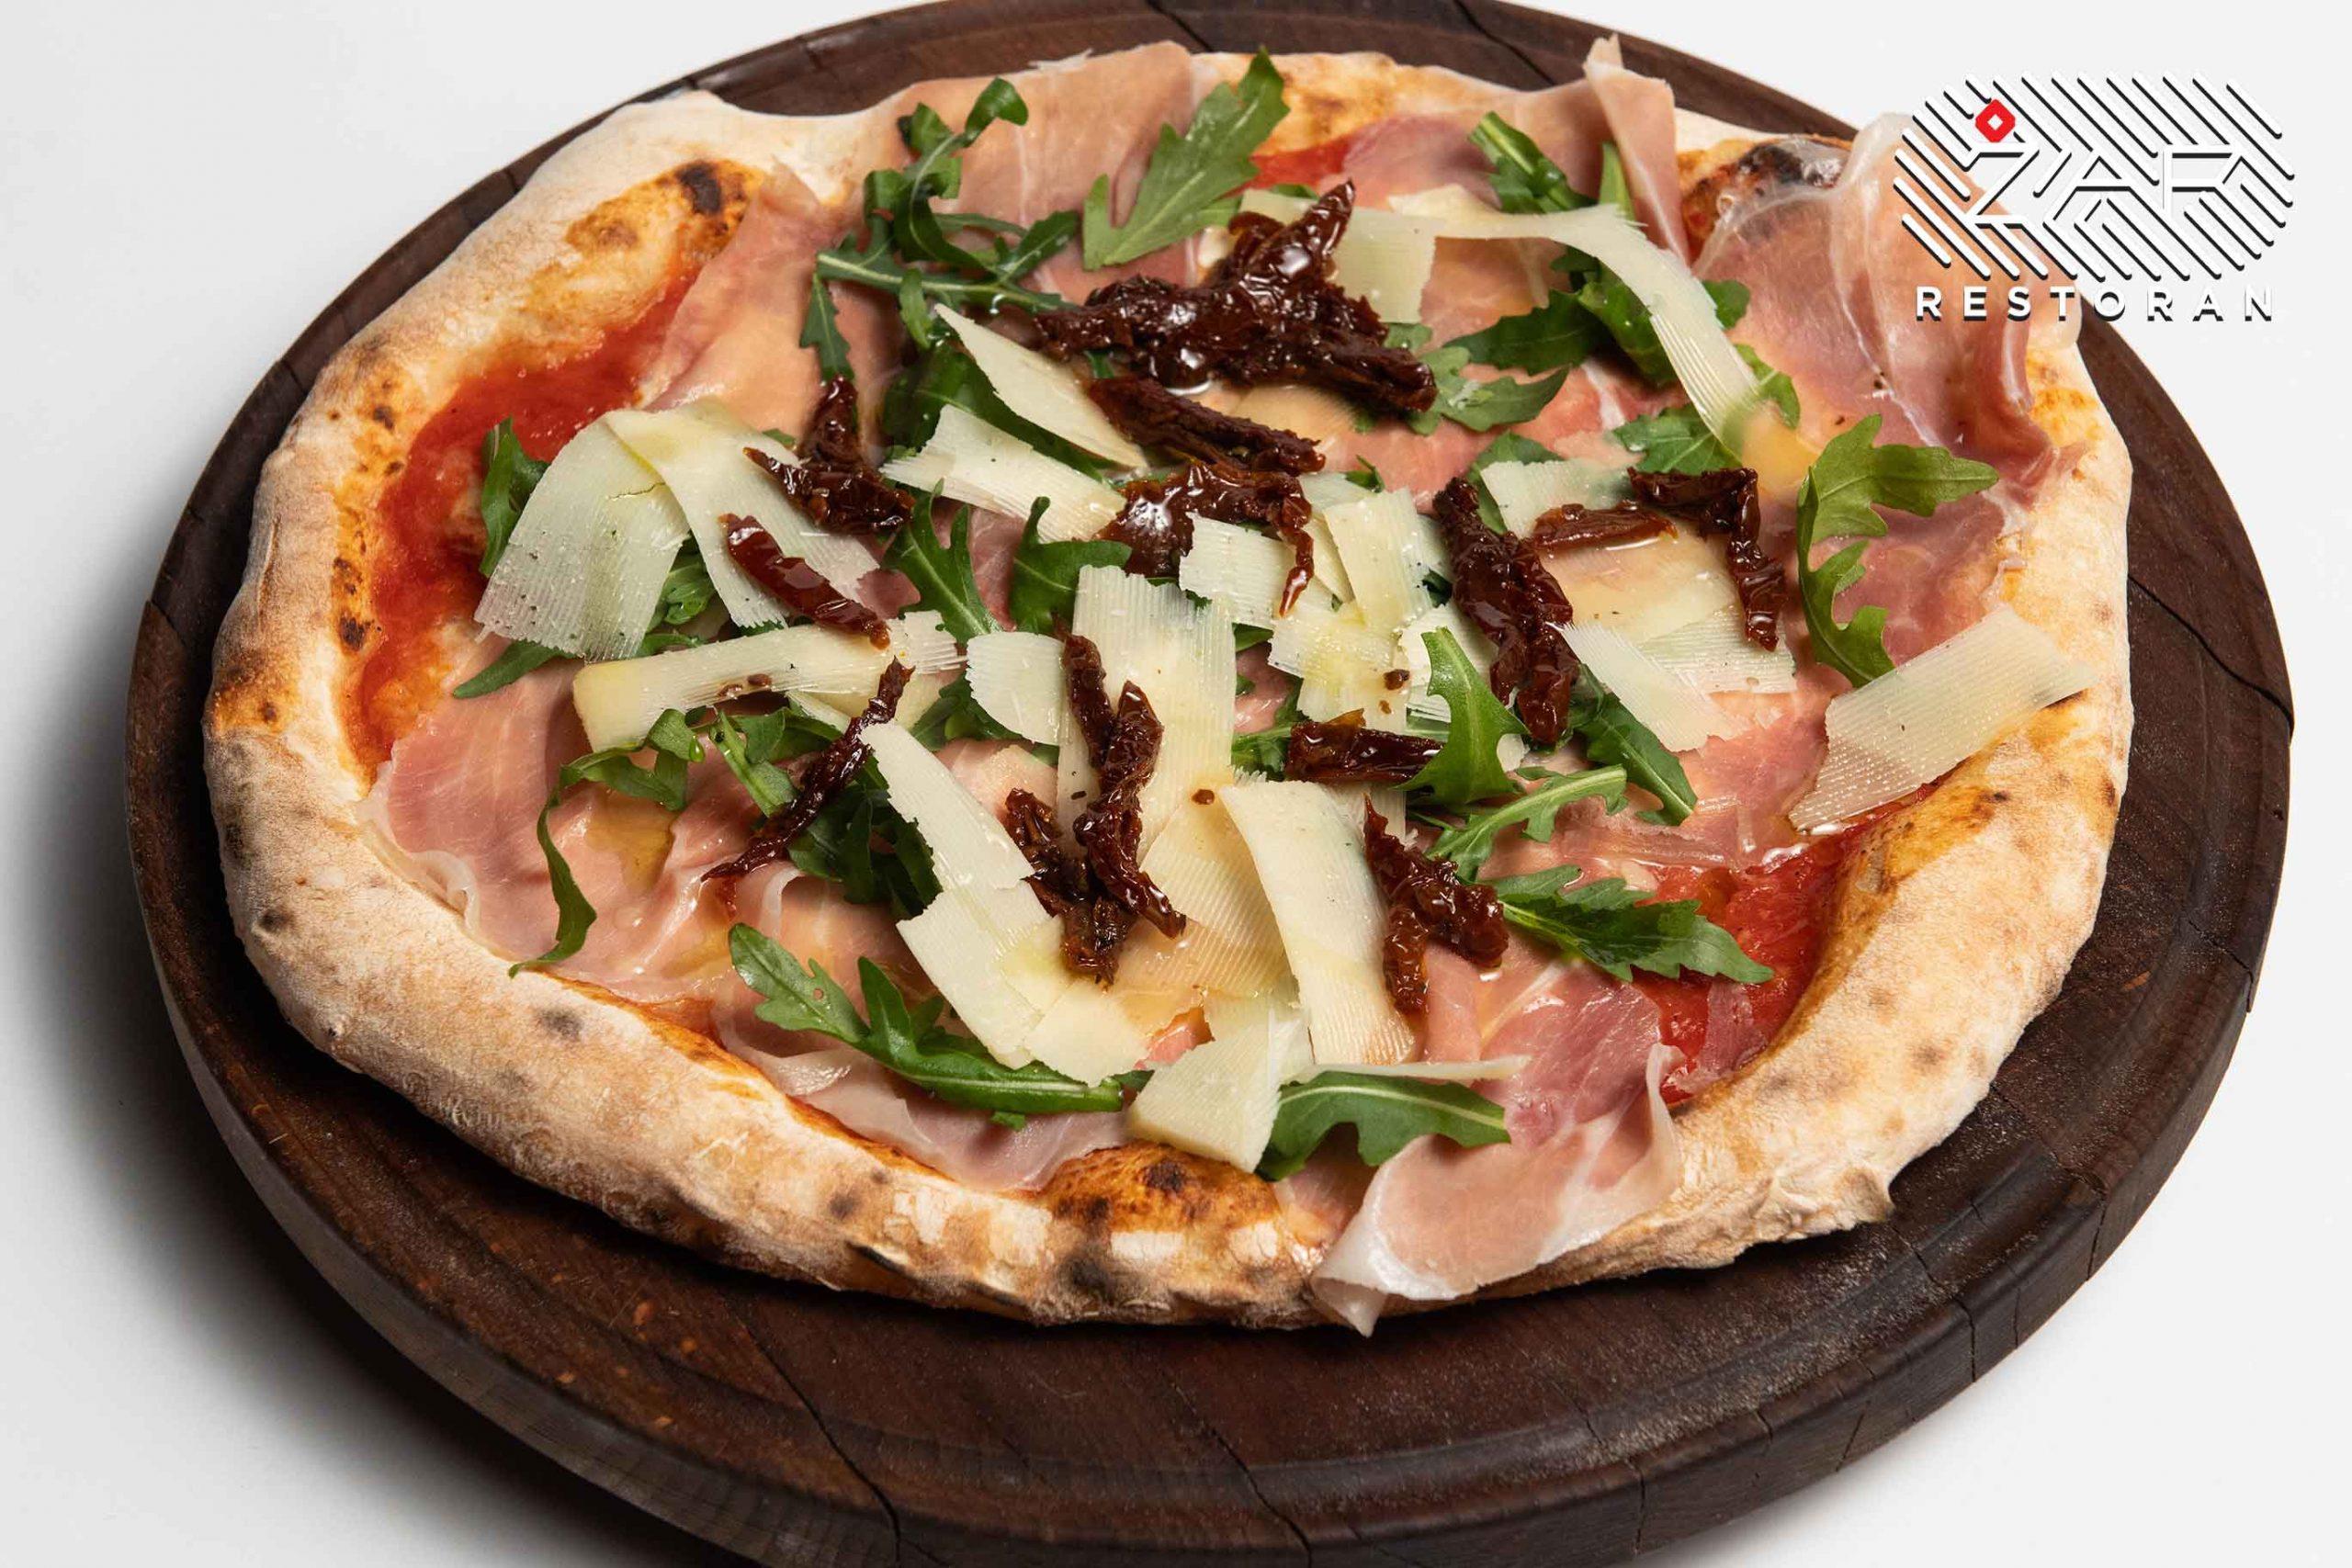 restoran-zar-mance-pizza-pizzaiolo-special